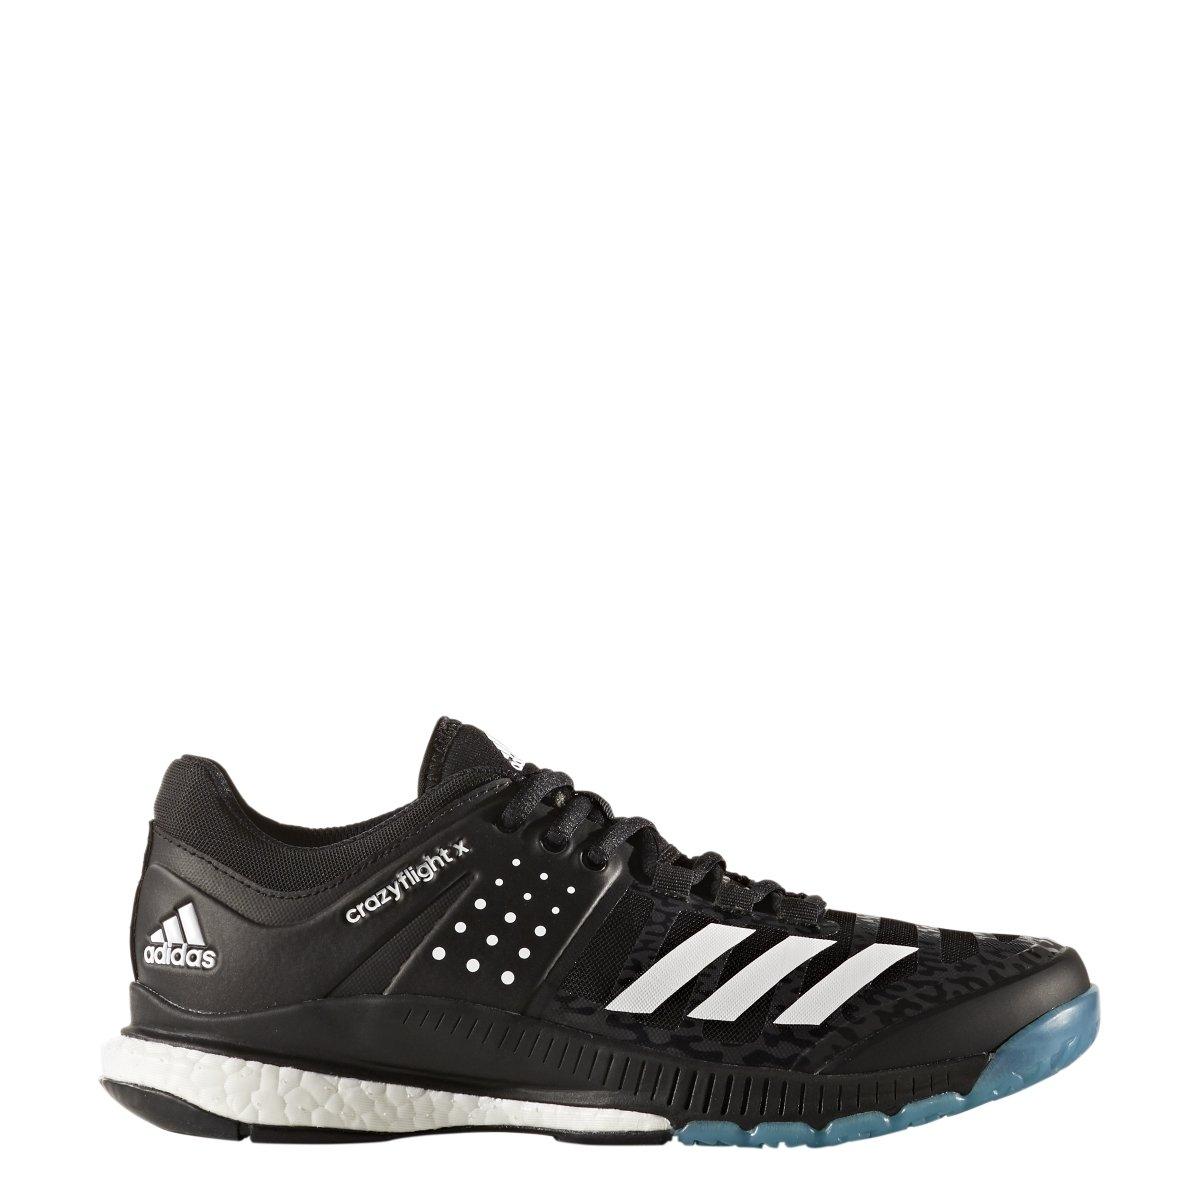 adidas Women's Crazyflight X Volleyball Shoe Black/White/Light Solid Grey,12 M US